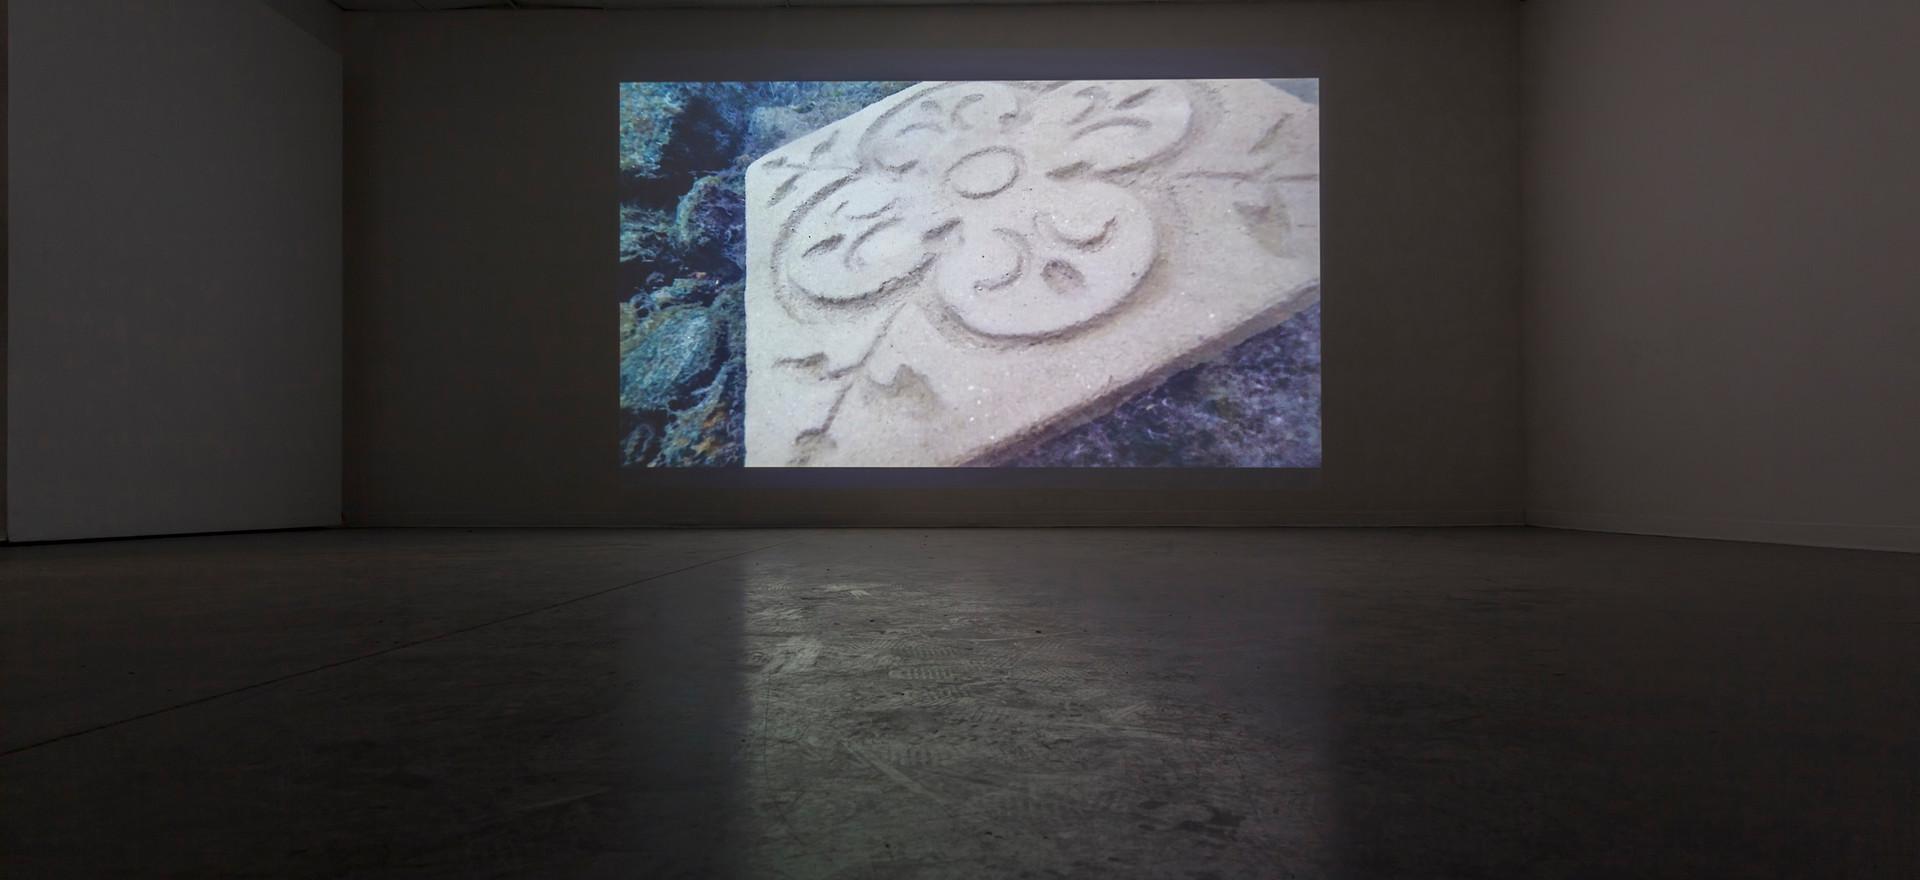 Tile flow - 3, 2017